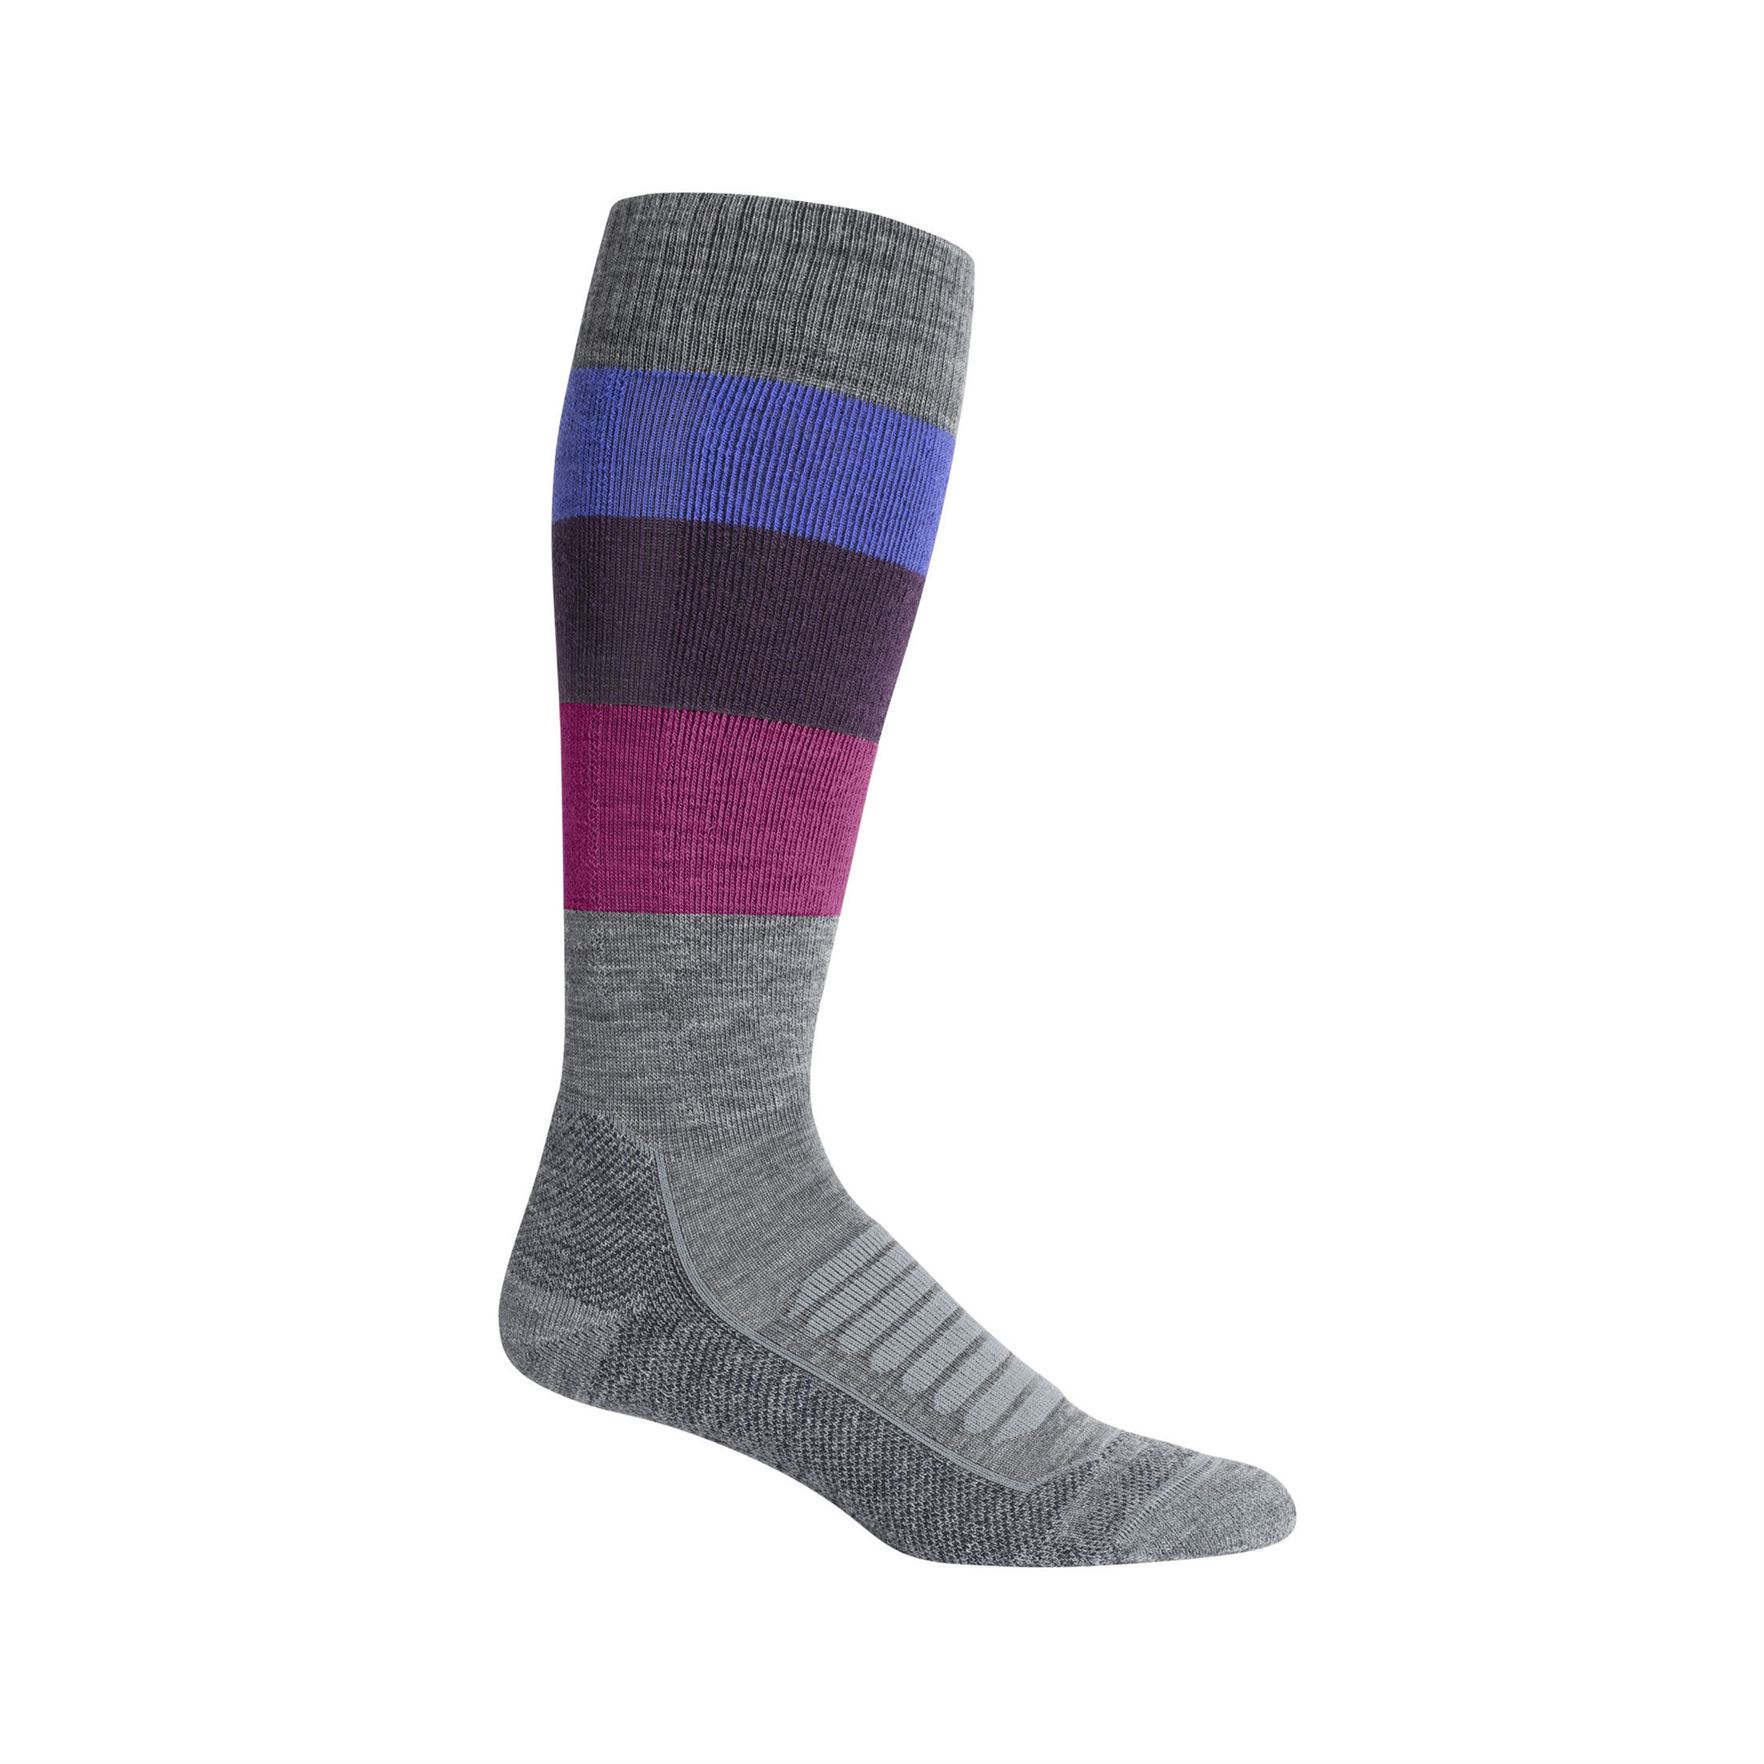 Ski+ Medium Over The Calf Wide Stripe Sock - Women's